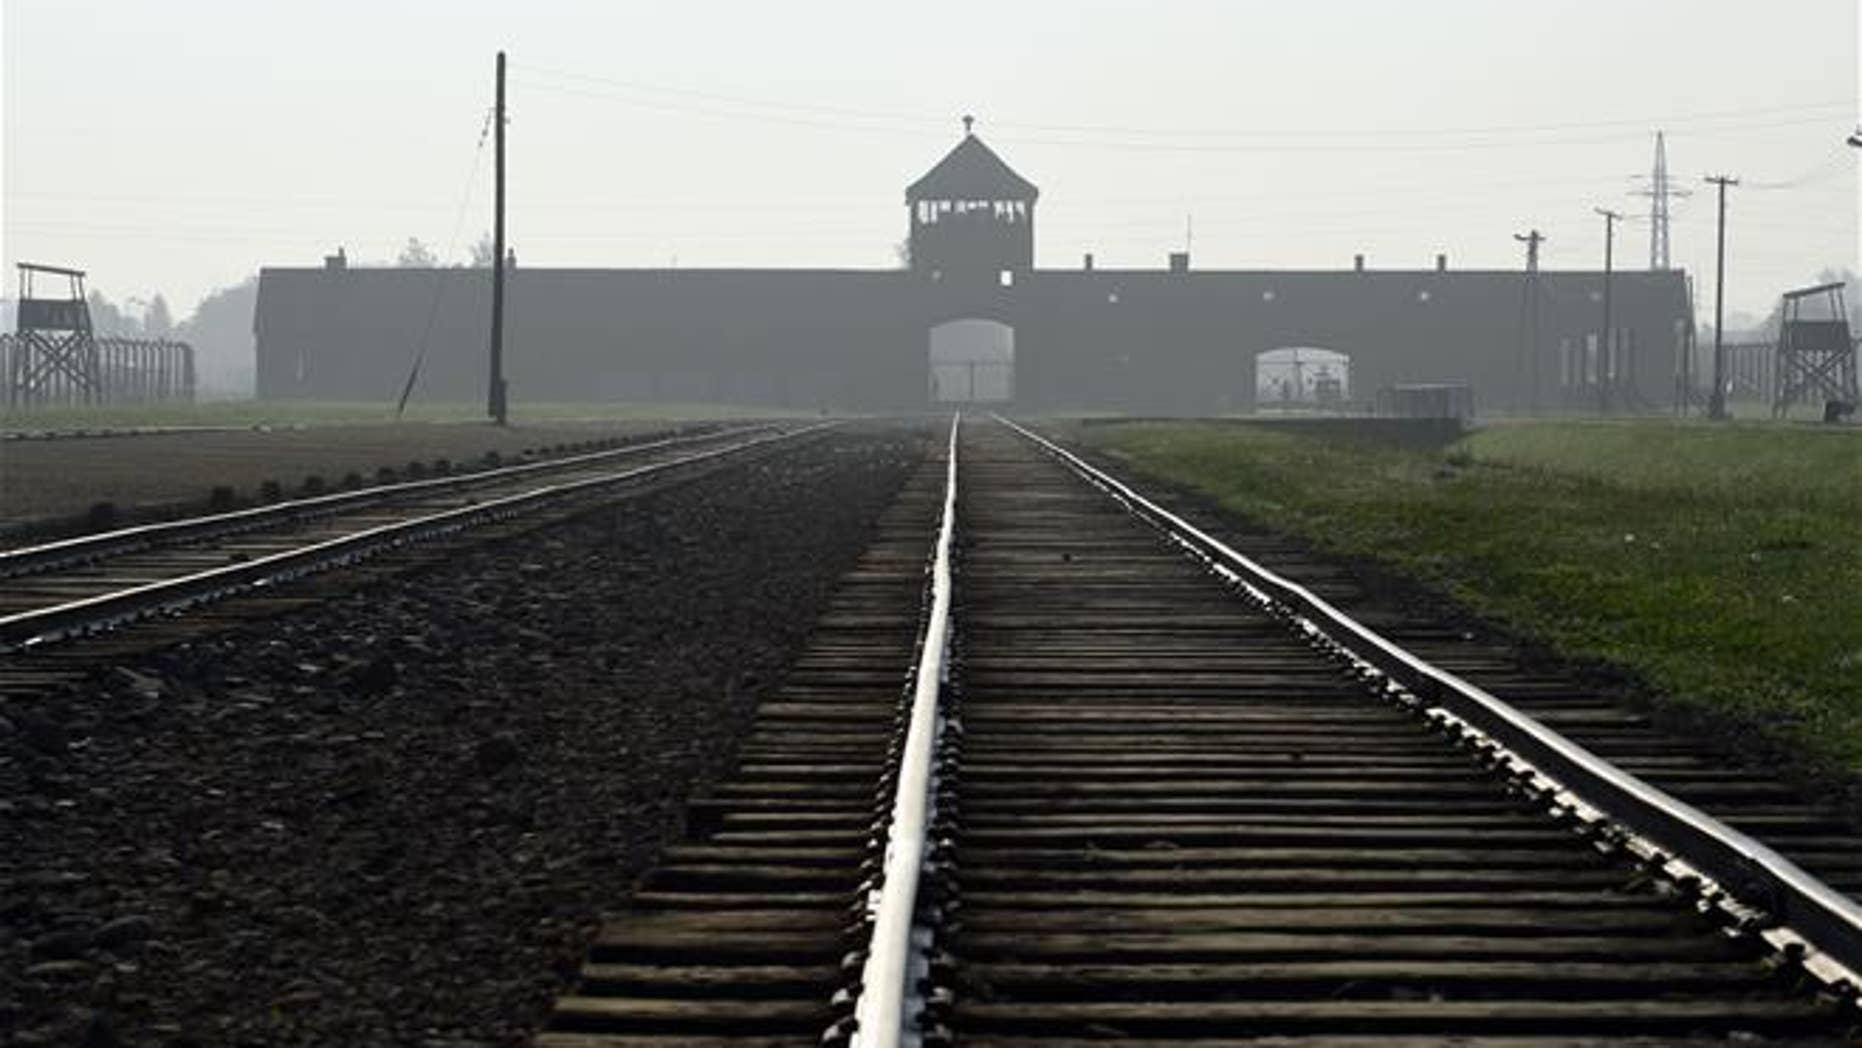 The entrance to the former Nazi German death camp of Birkenau in Oswiecim, Poland. (AP Photo/Alik Keplicz, File)